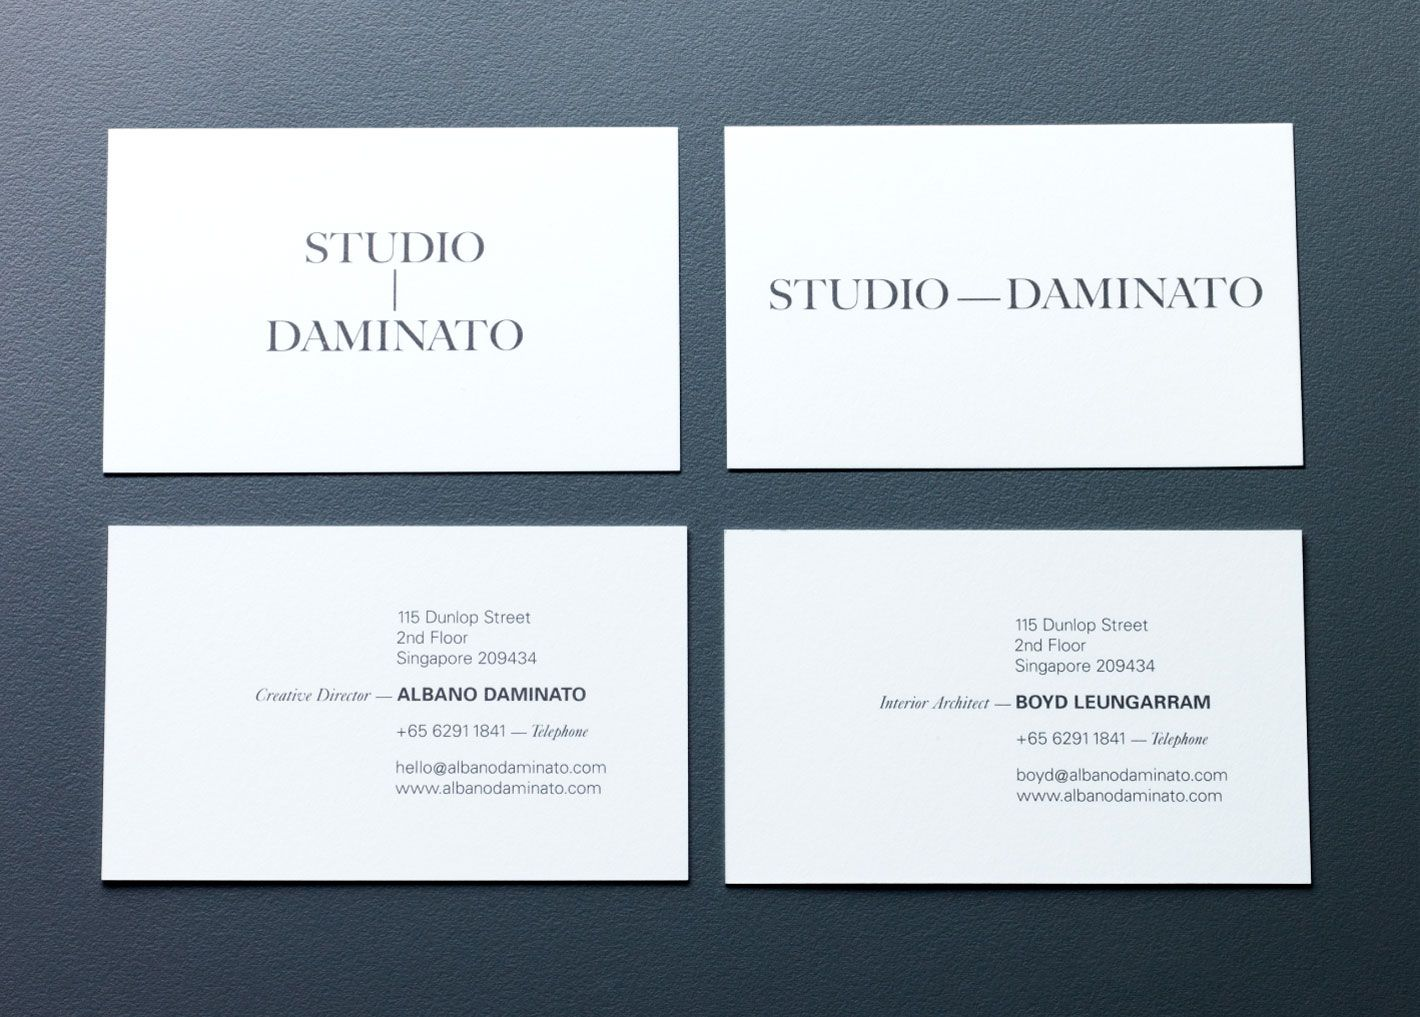 Studio Daminato by &Larry | Singapore Design Scene | Pinterest ...